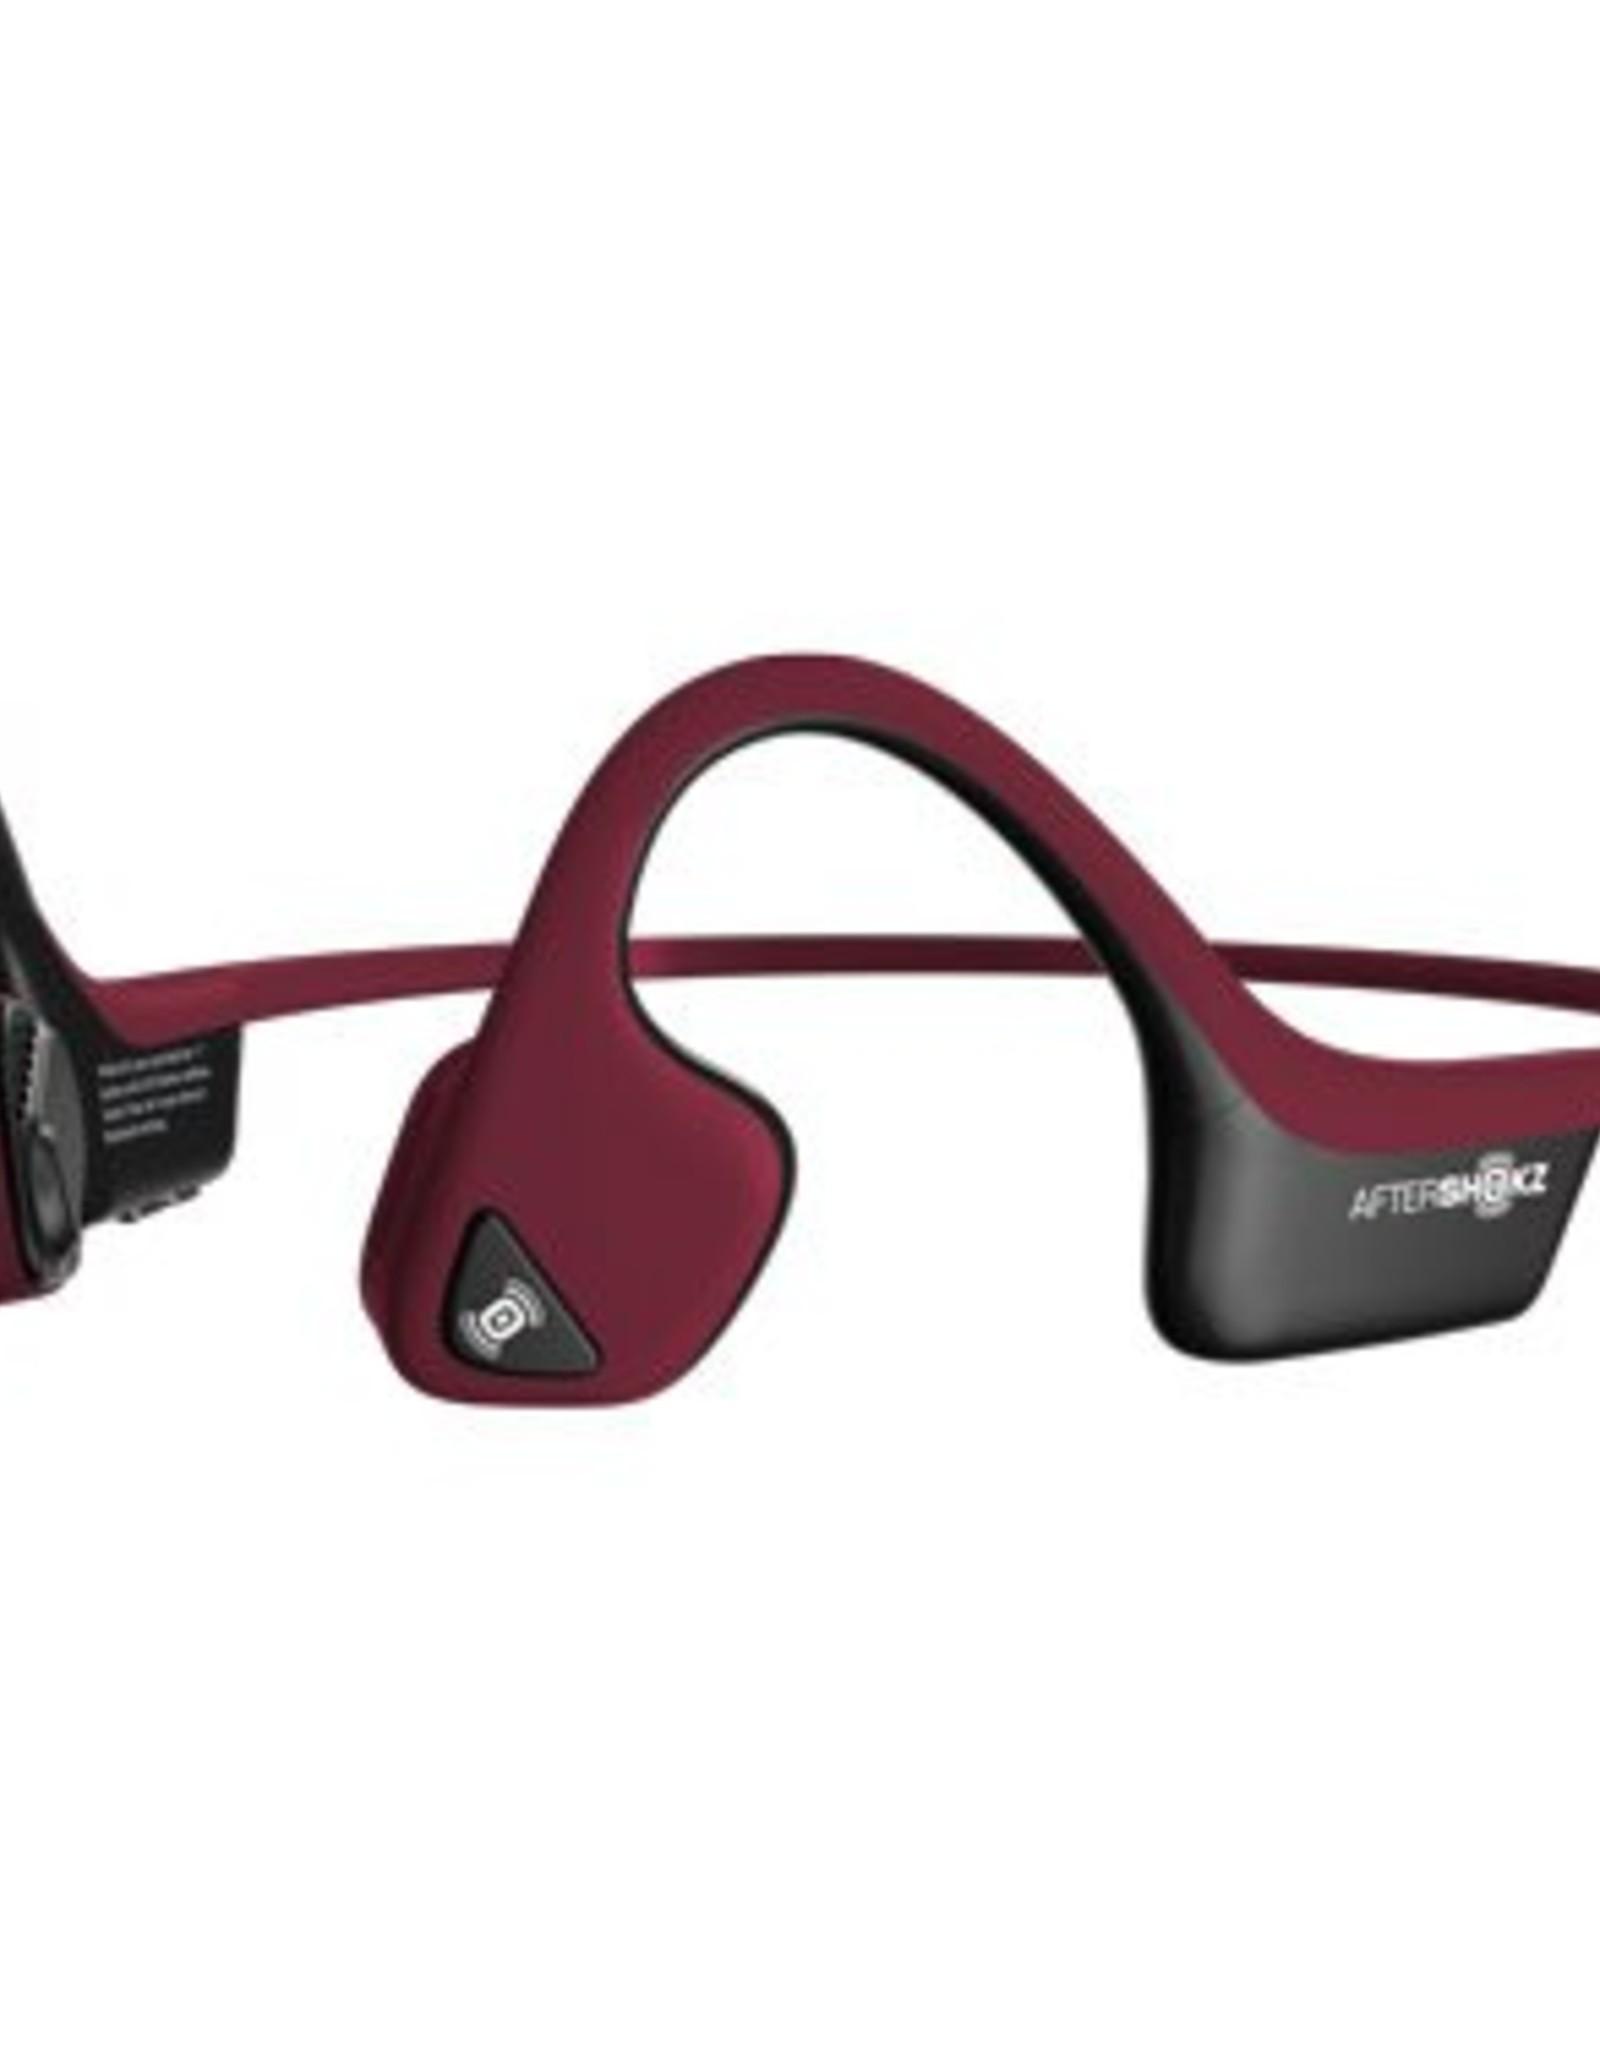 Aftershokz Aftershokz | Trekz Air Canyon Red Bluetooth 4.2 Headphone | AS650CR